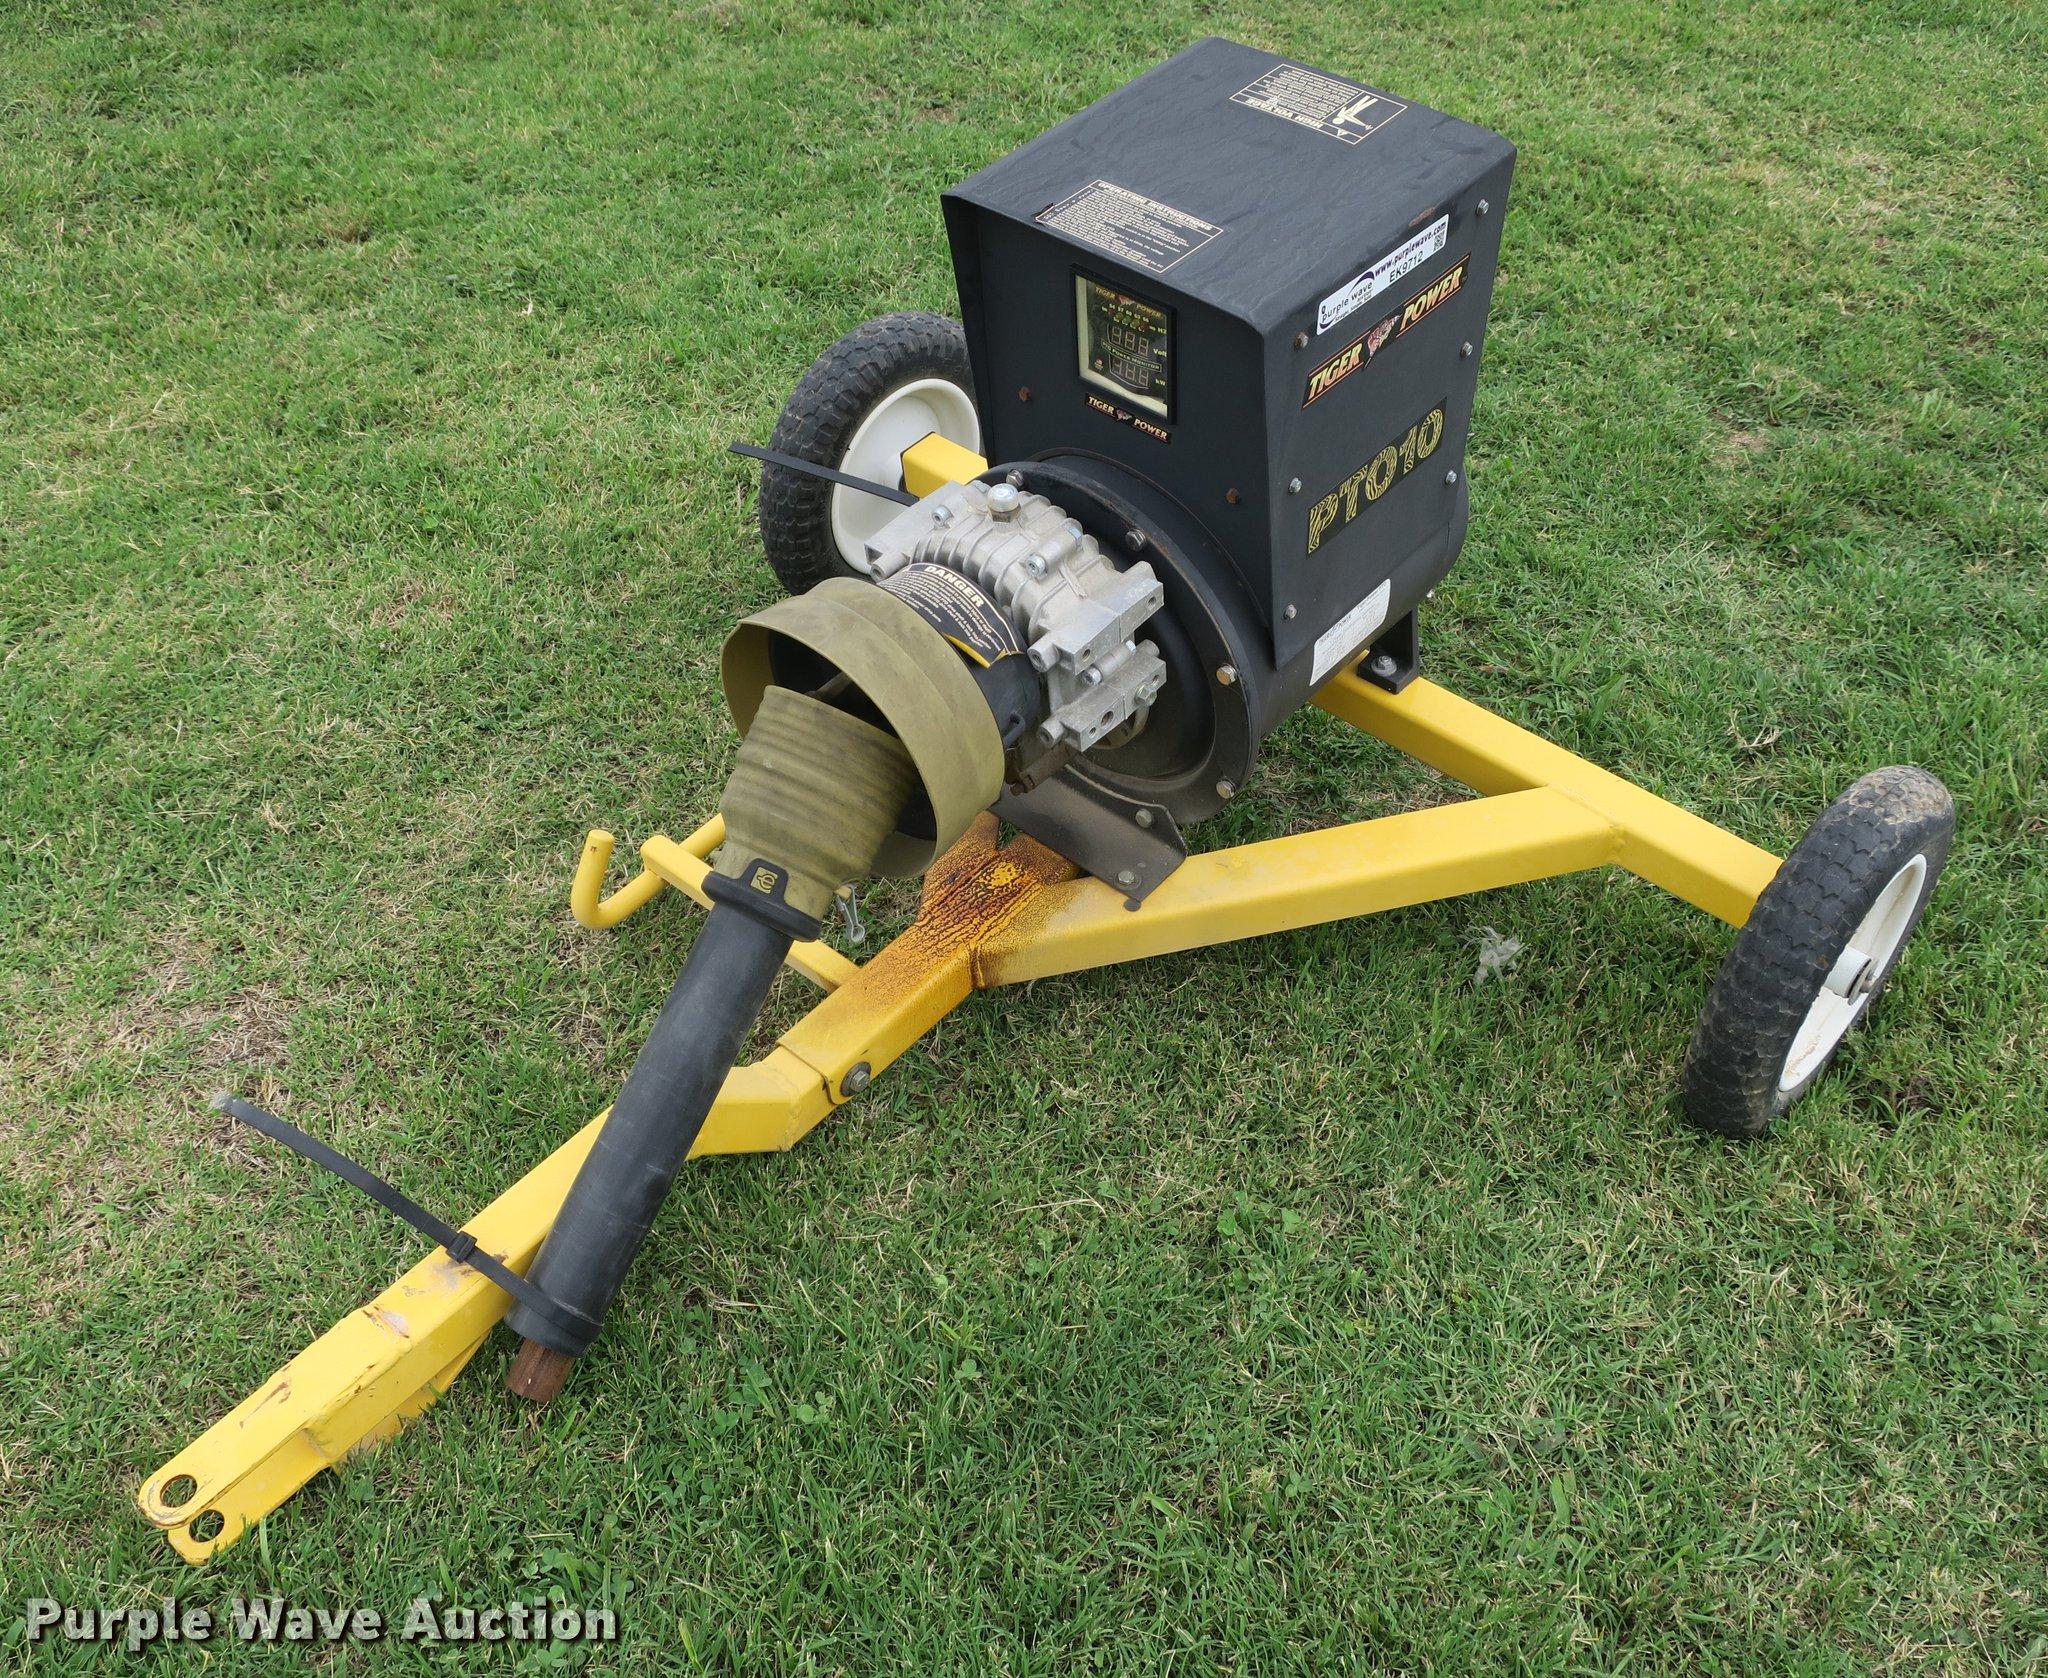 Tiger Power PT010 generator | Item EK9712 | SOLD! August 22